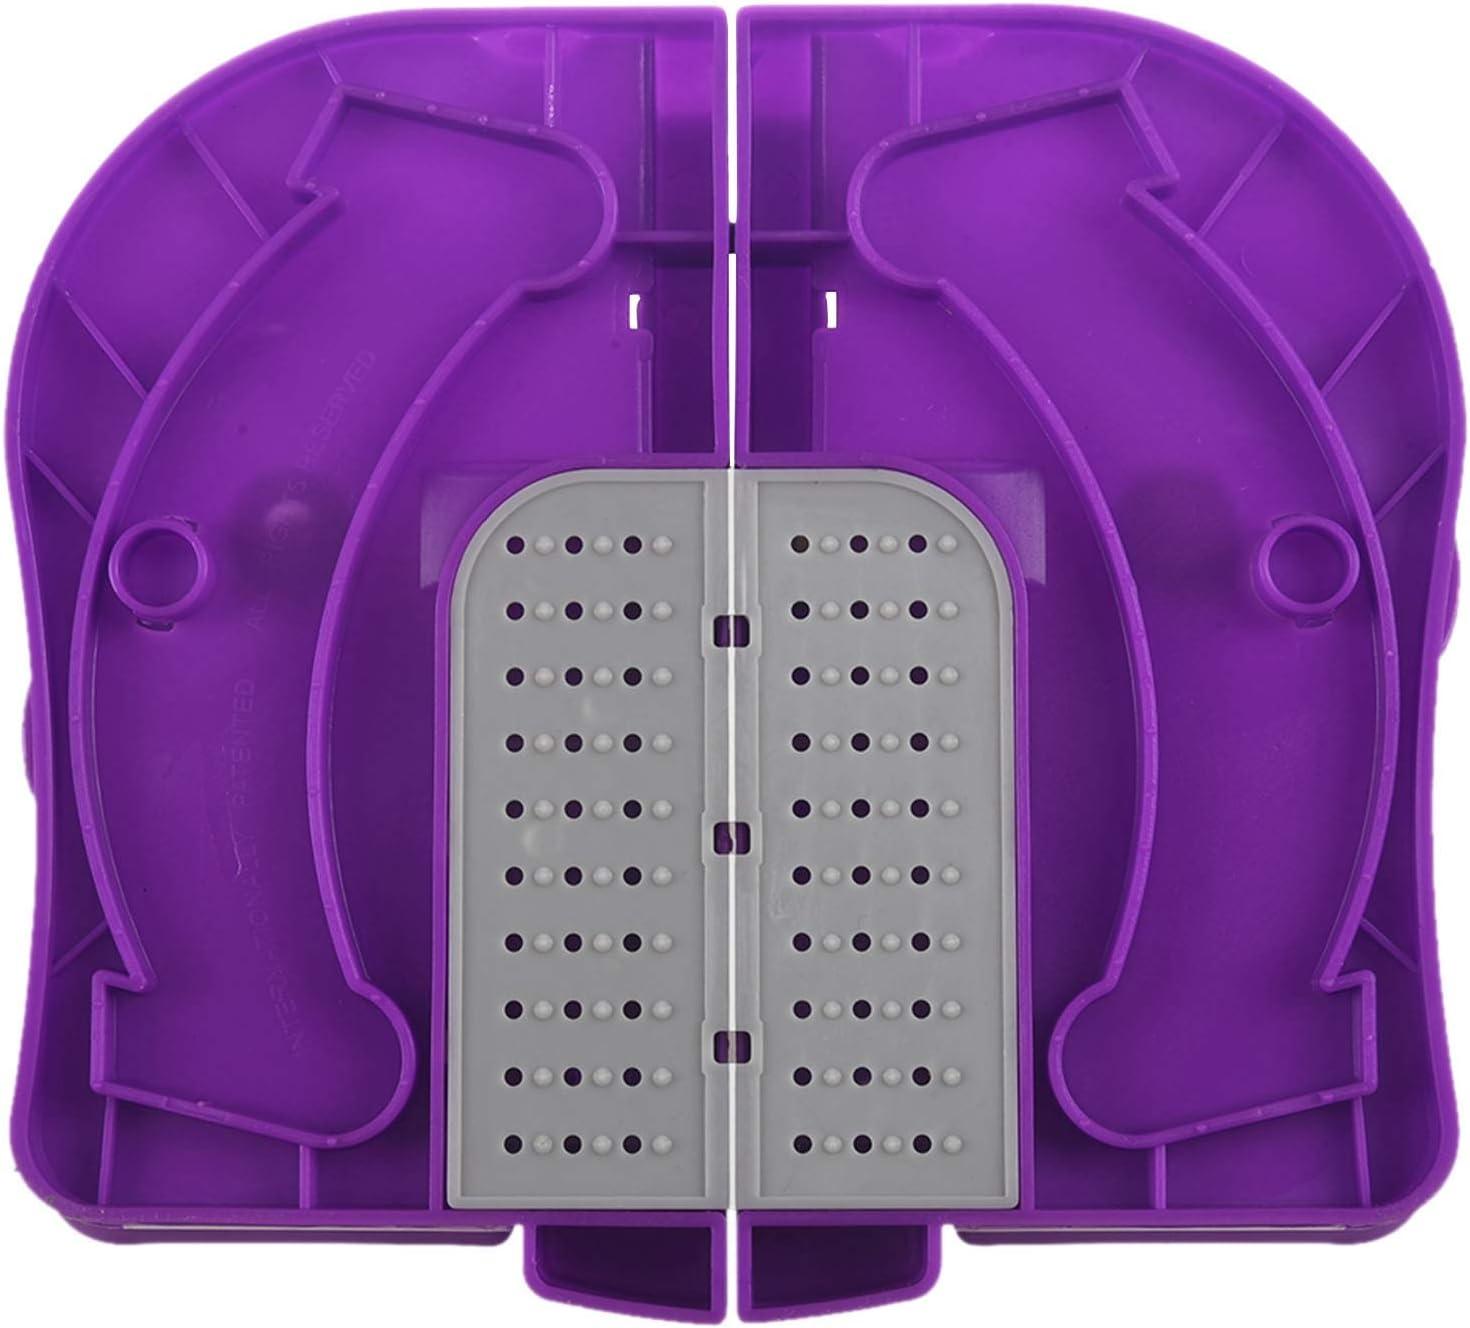 TTBD Stepper Home Mute Weight Loss Machine in Situ Climbing Foot Machine Multi-Functional Fitness Equipment Stovepipe Machine